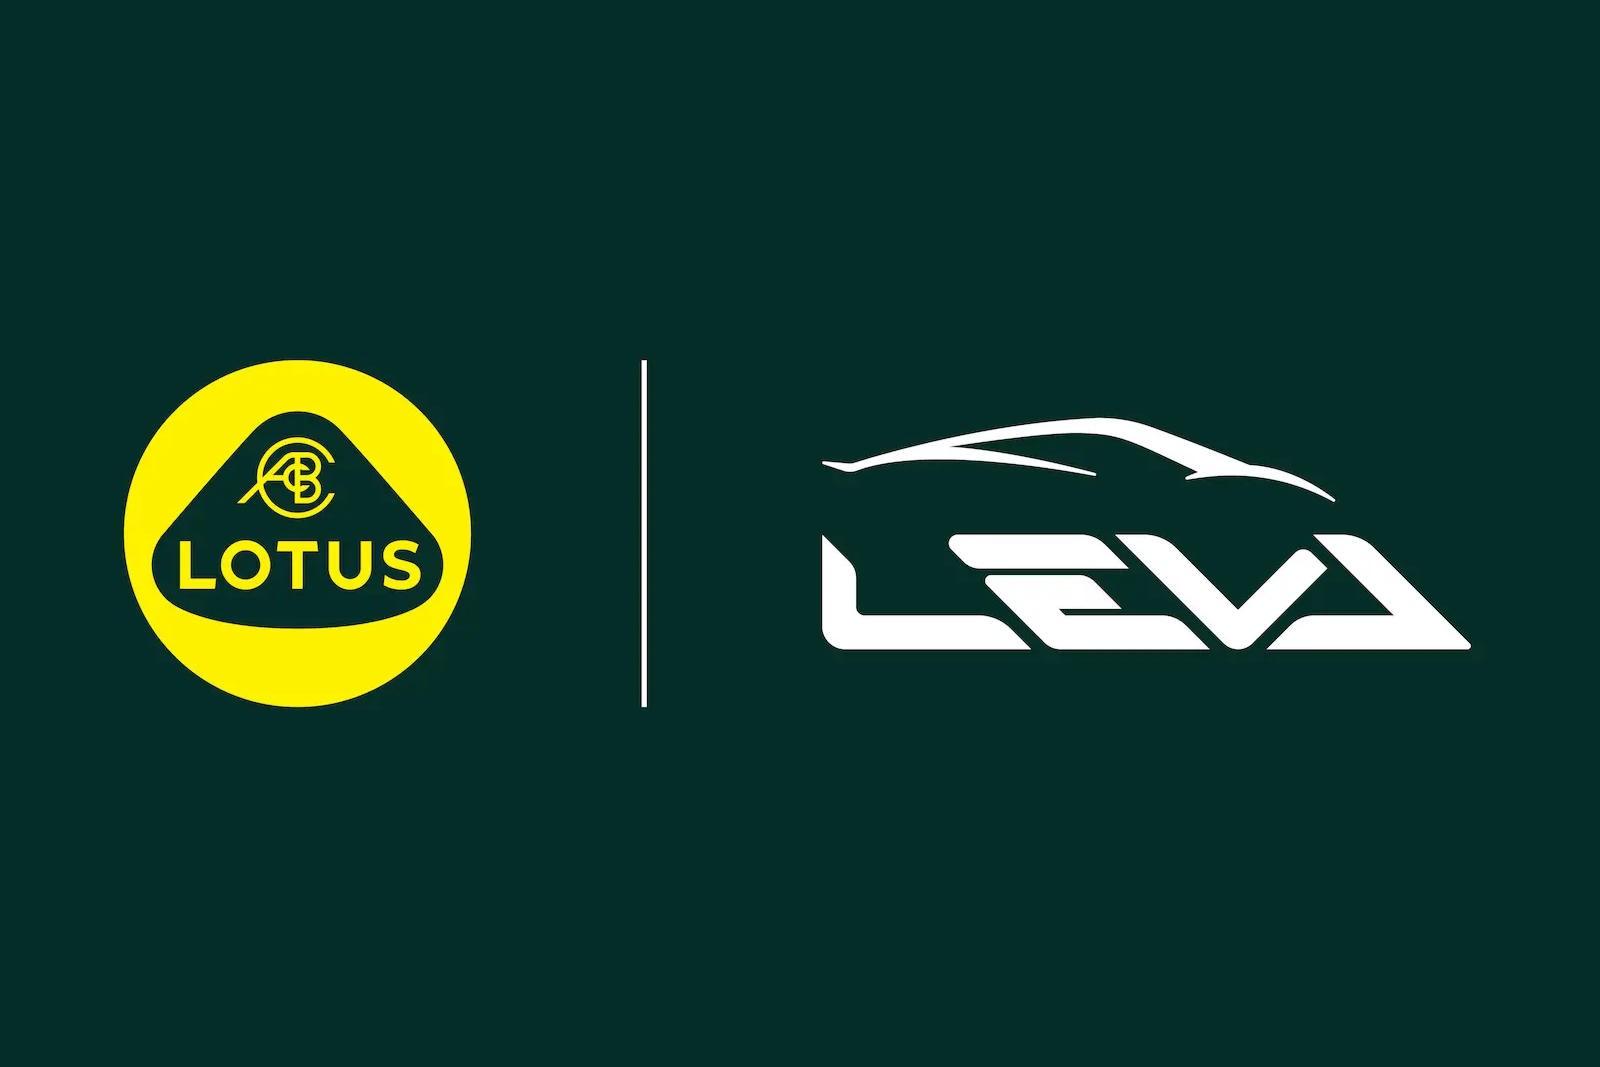 Sportautofabrikant Lotus ontwikkelt platform LEVA